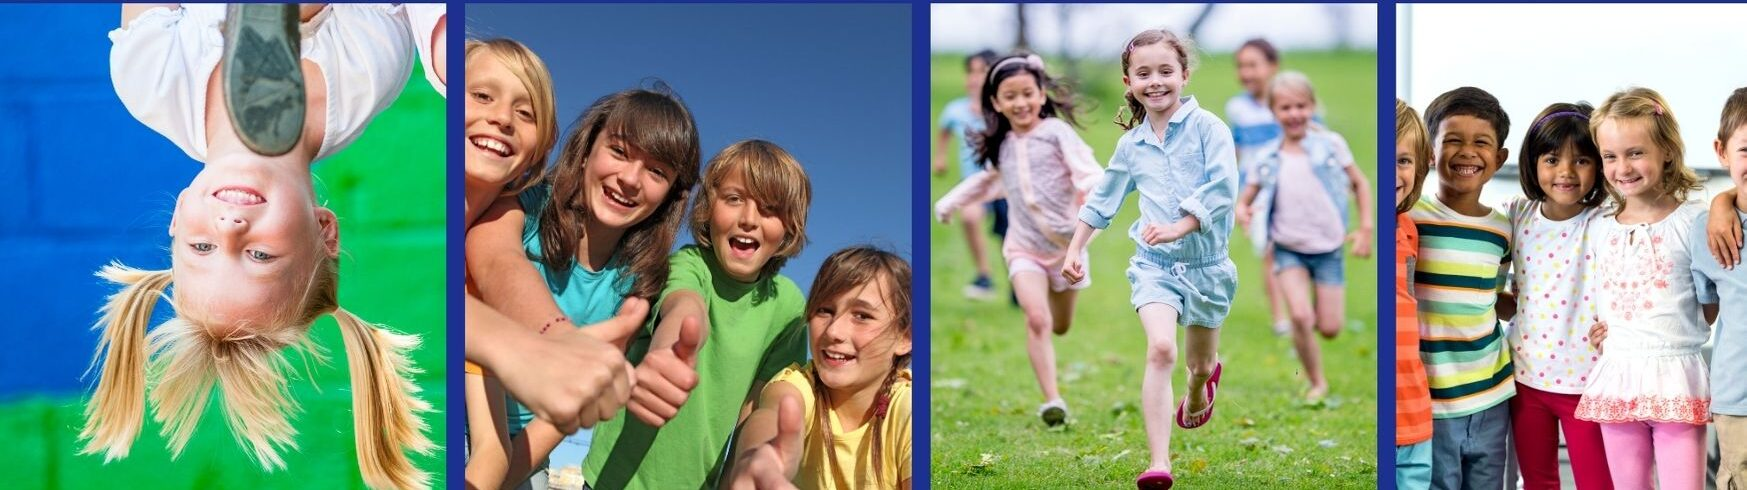 various pictures of kids having fun